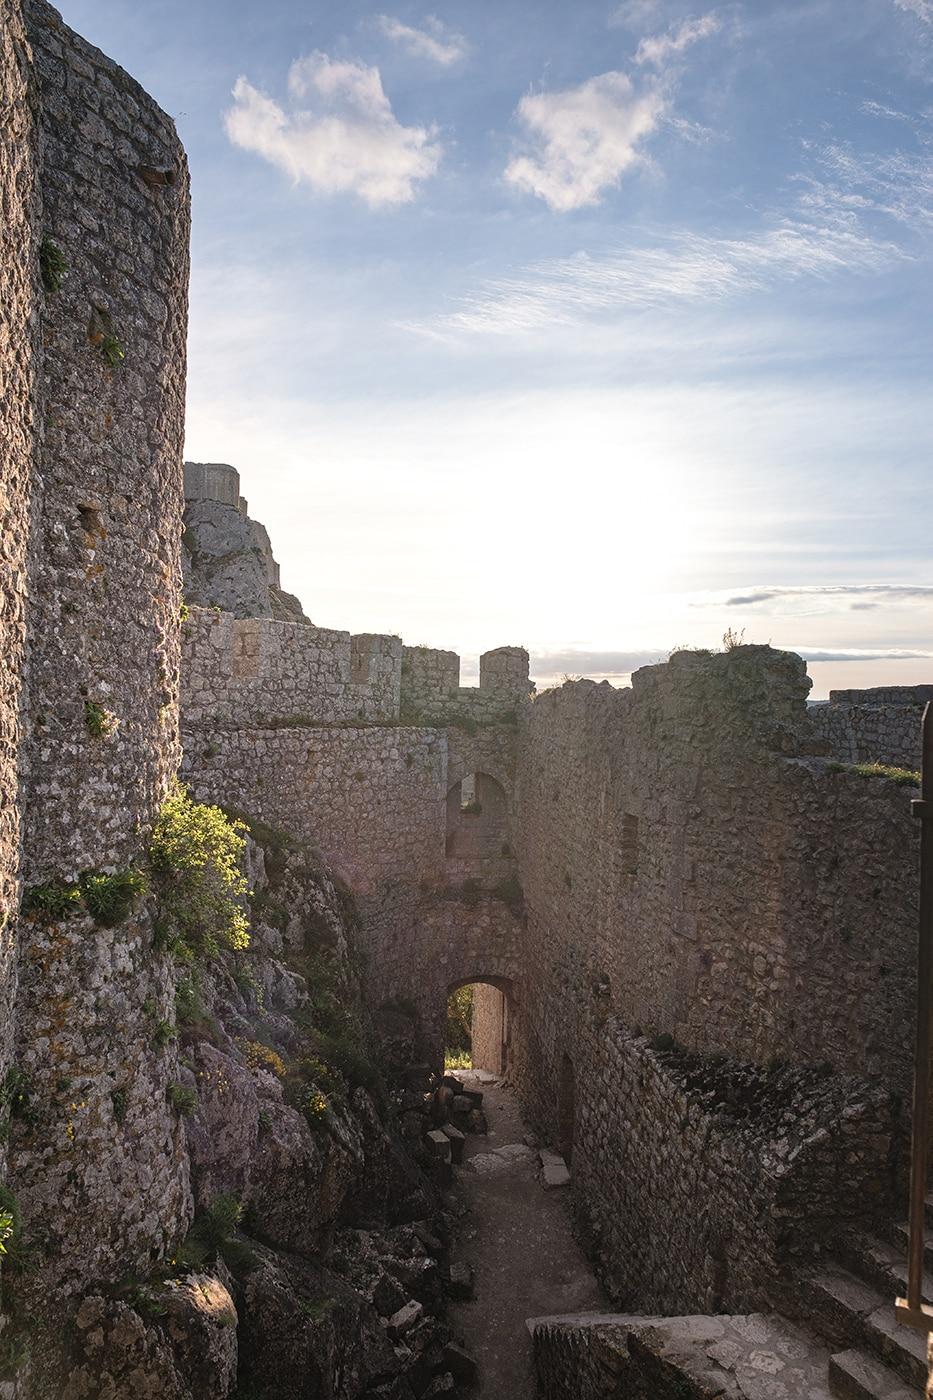 Peyrepertuse château cathare